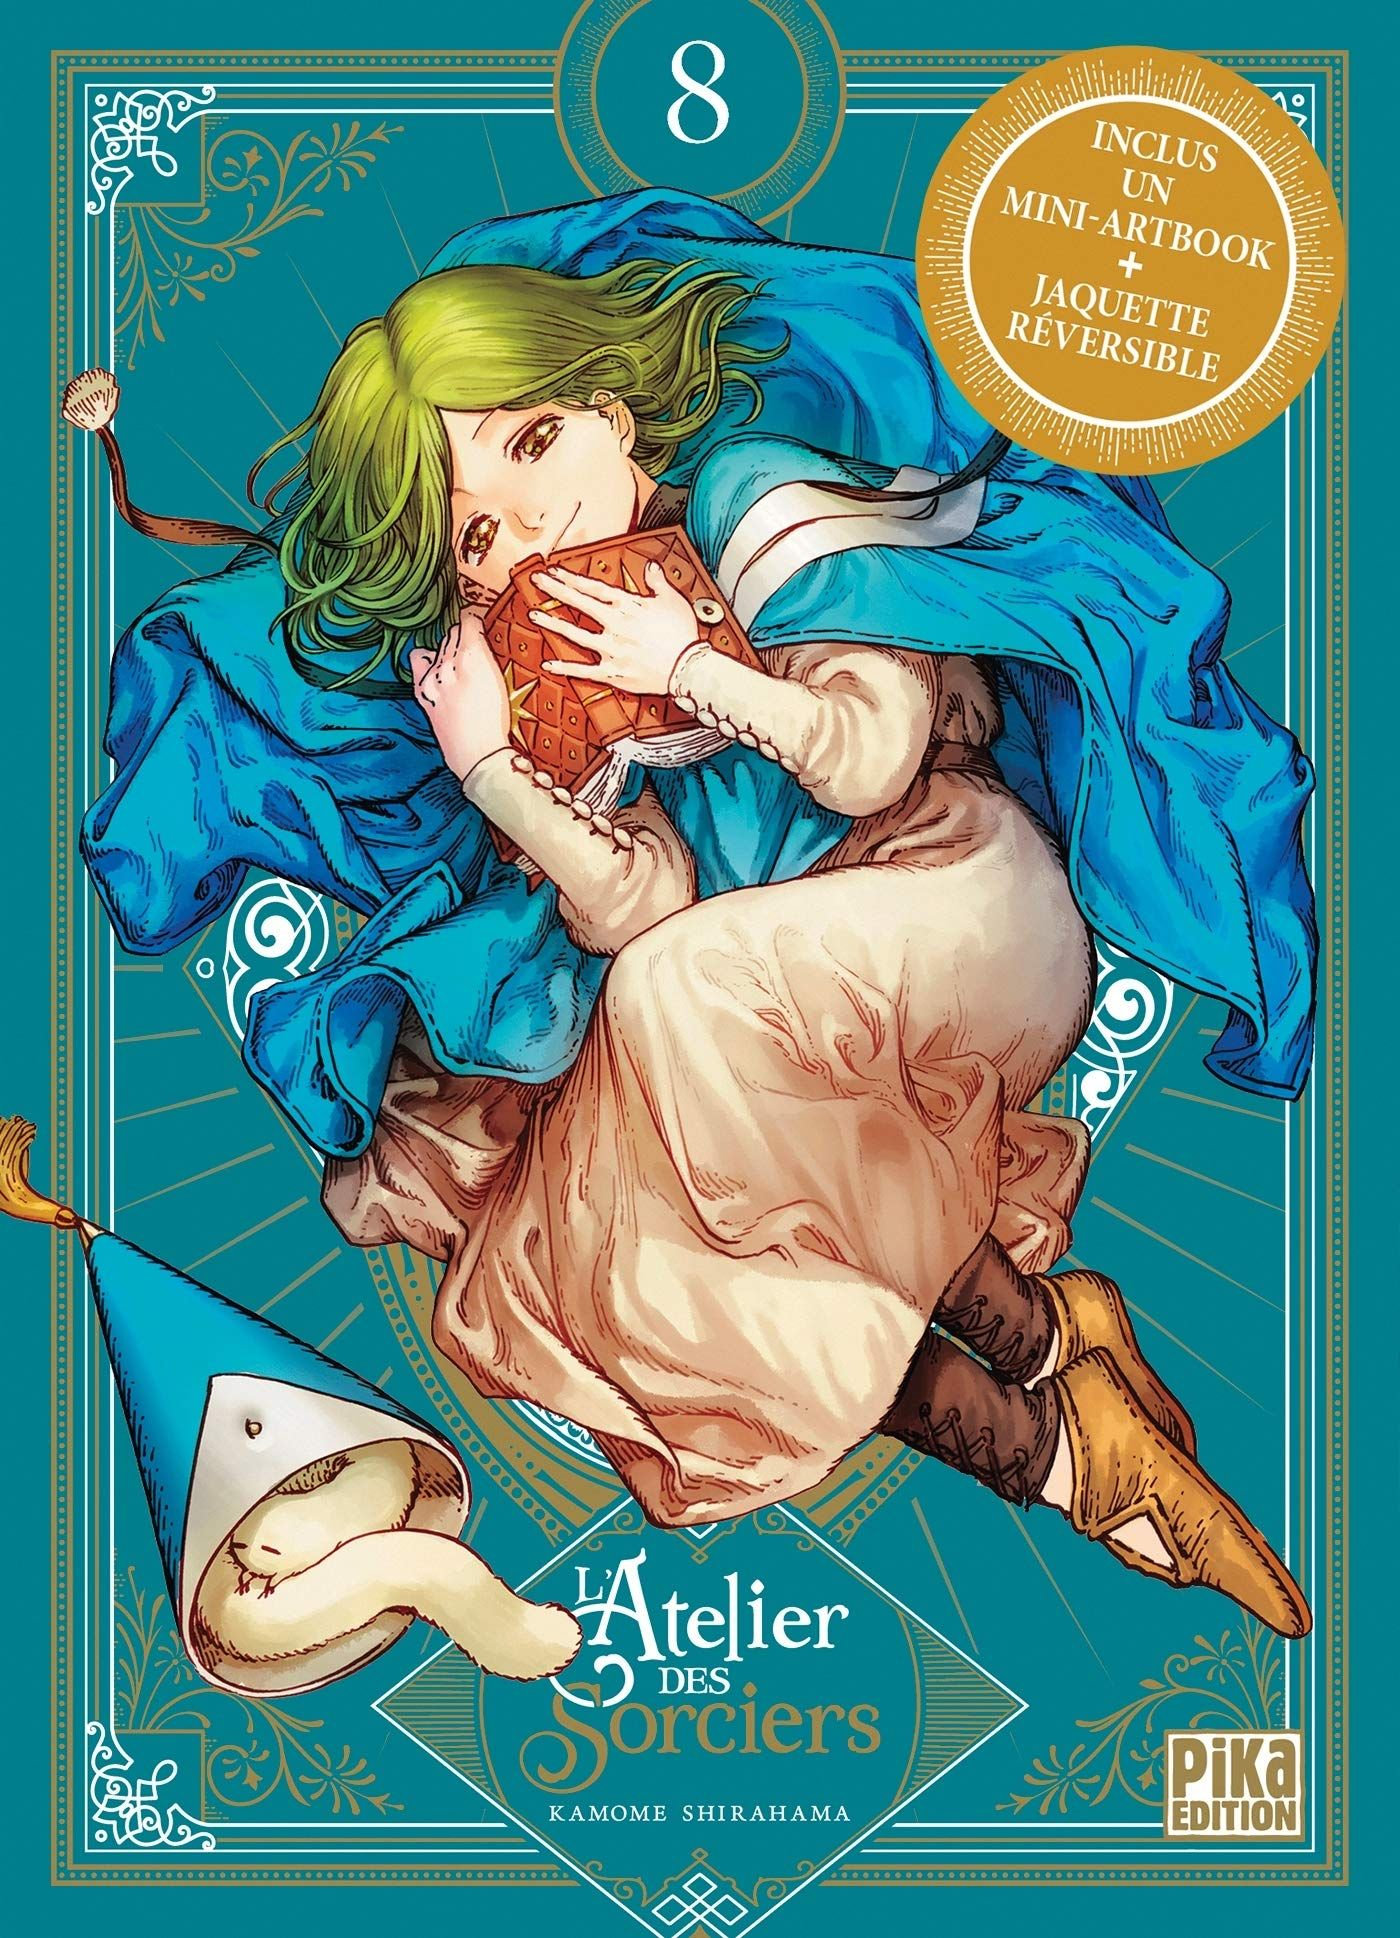 Manga - Manhwa - Atelier des sorciers (l') - Collector Vol.8